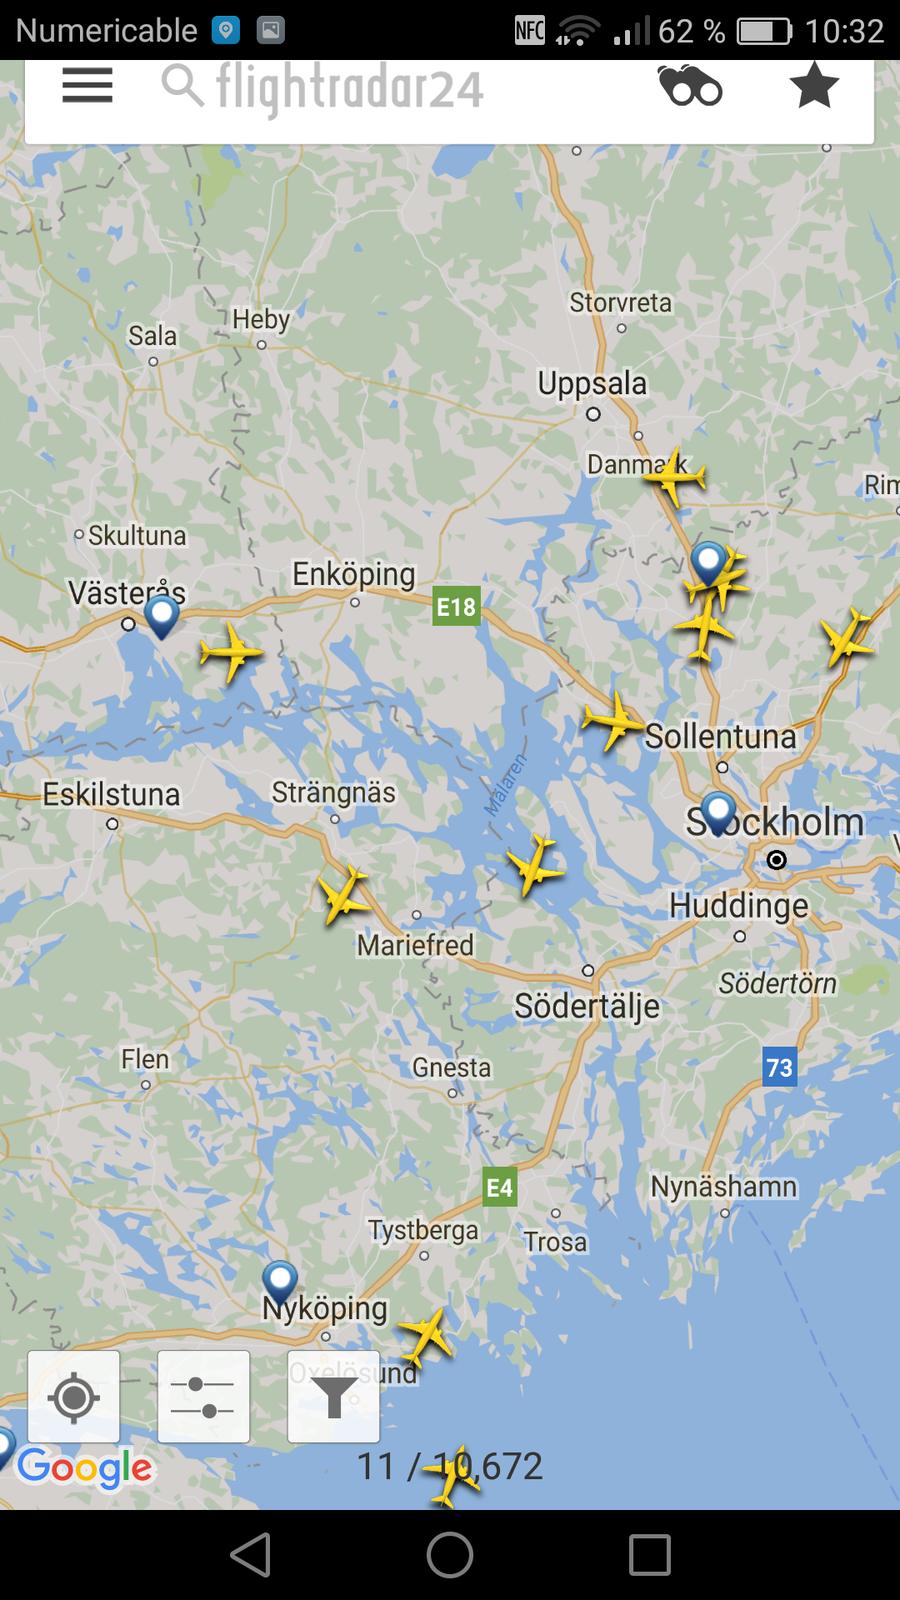 En bas, Nyköping-Skavsta. Pas mal de trafic sur Arlanda en haut de l'image.